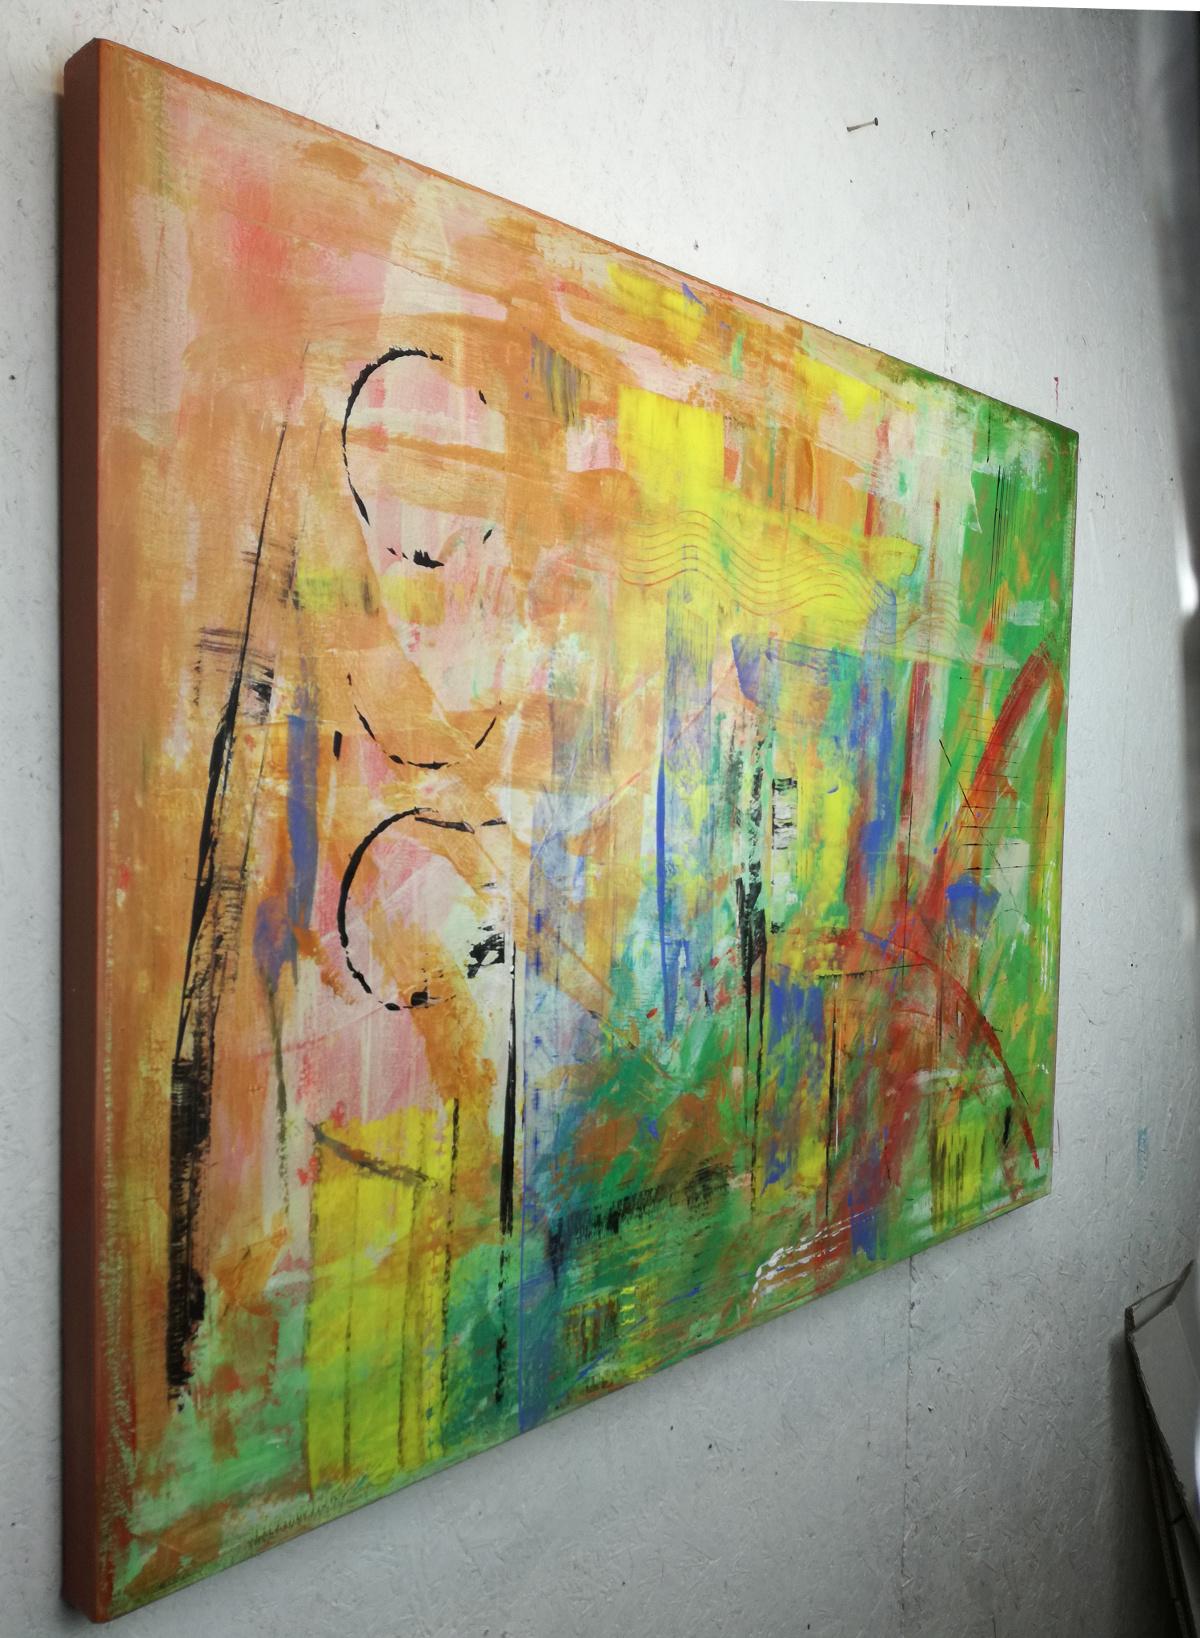 quadri moderni fatti a mano 120x90 xxl-1